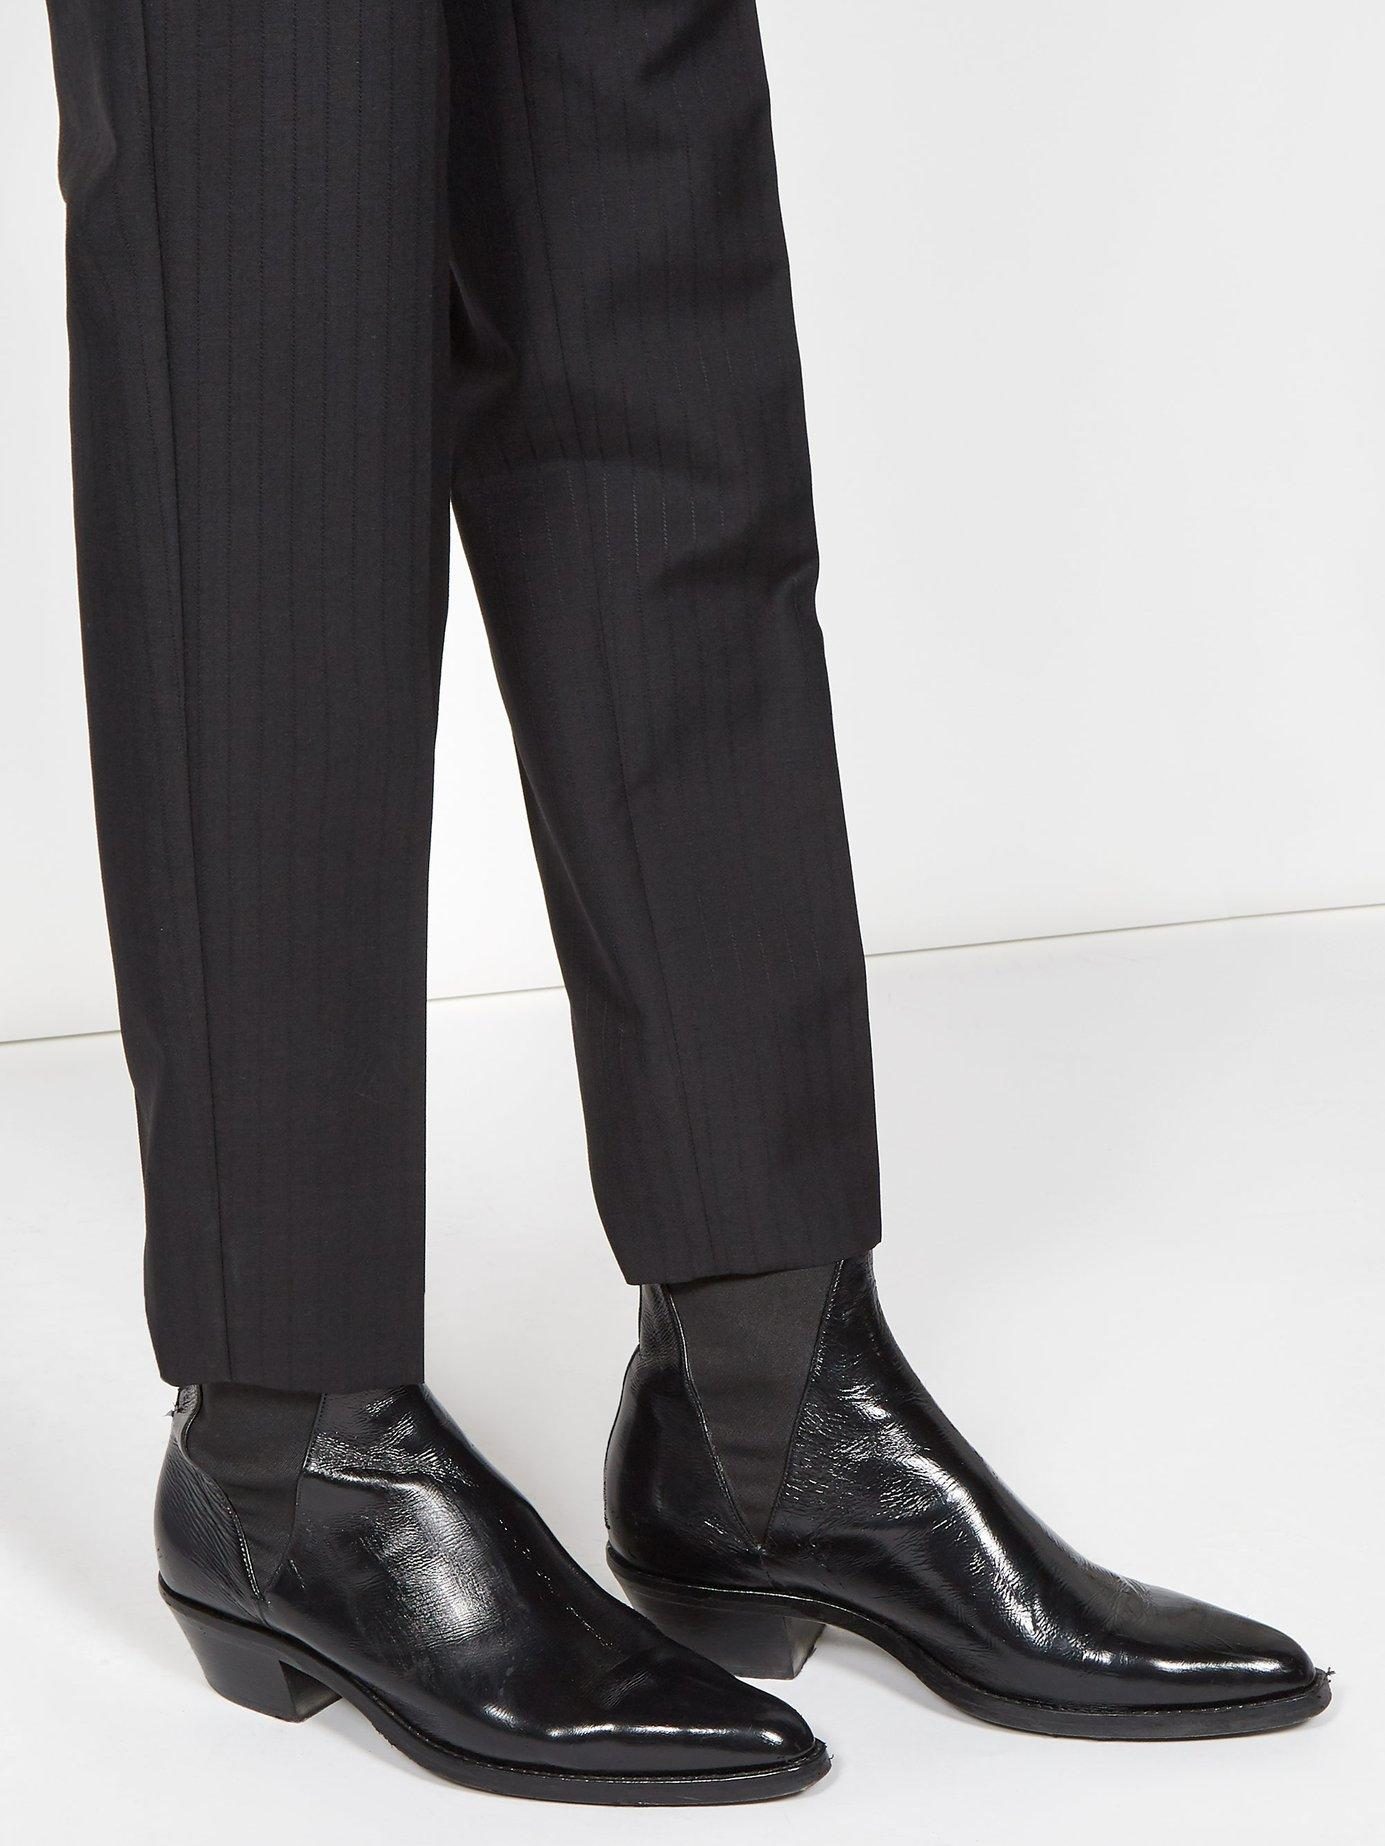 3358f5e7f21f Lyst - Saint Laurent Dakota Leather Chelsea Boots in Black for Men